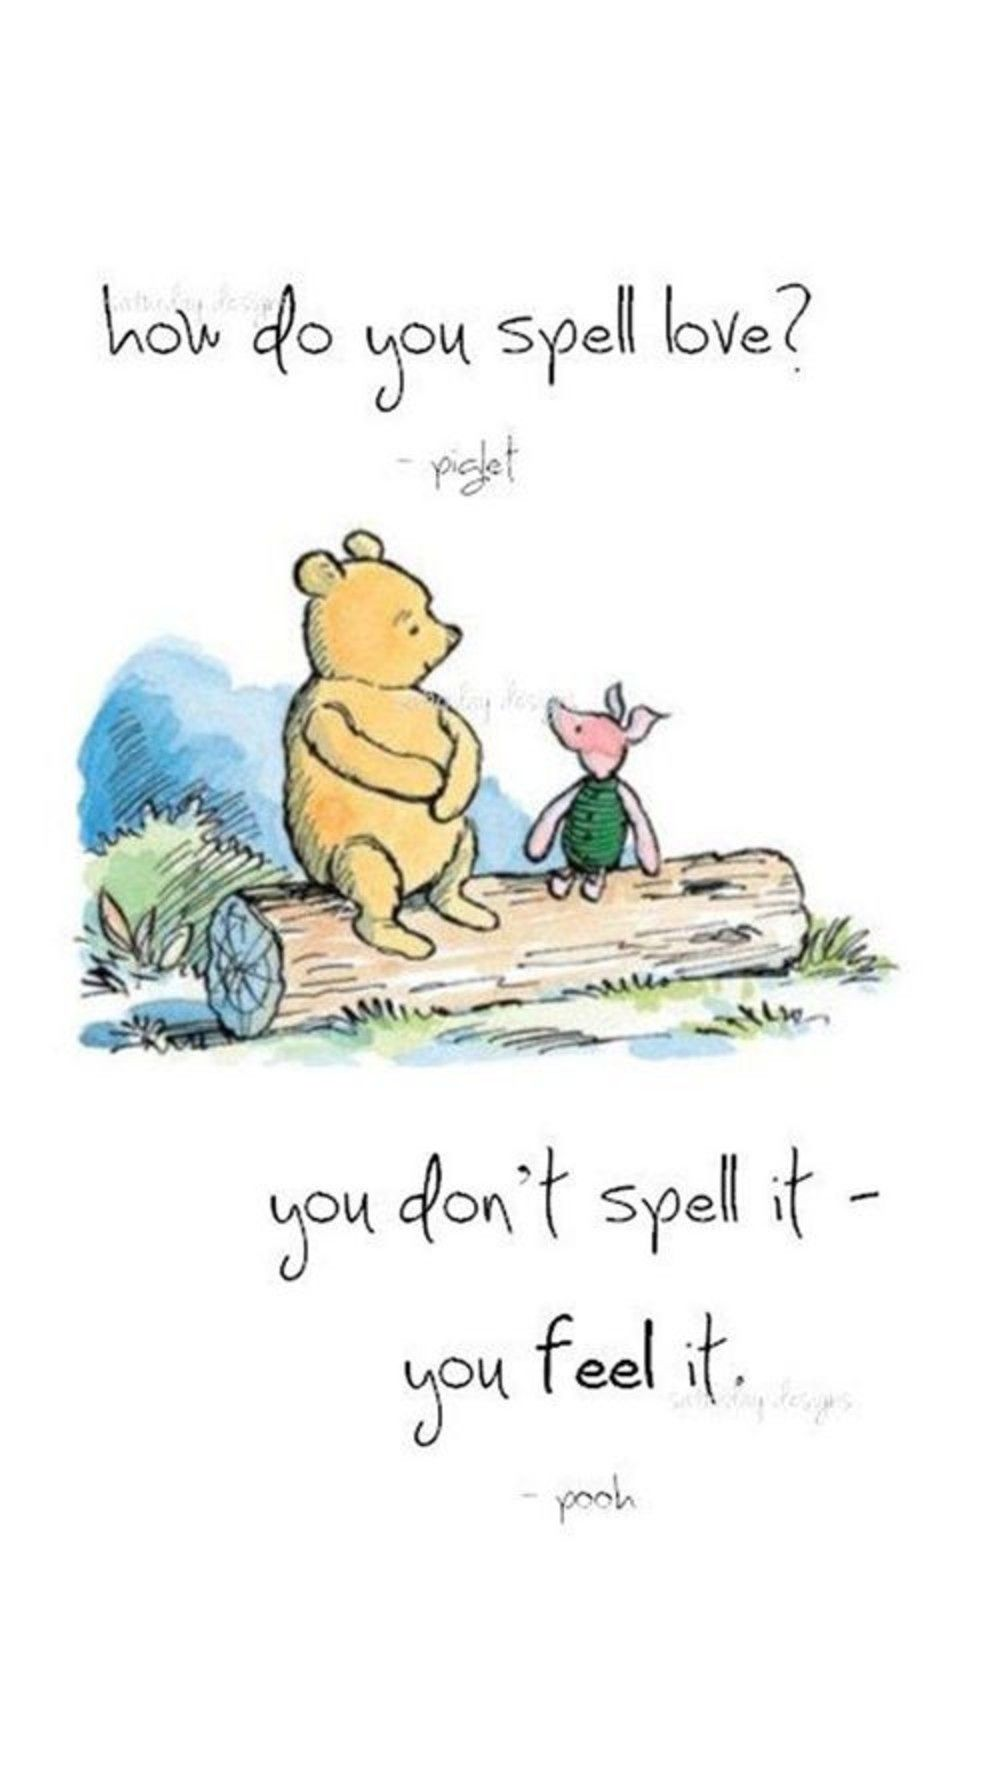 Citaten Succes : How do you spell love pooh 名言 言葉 en くまのプーさん